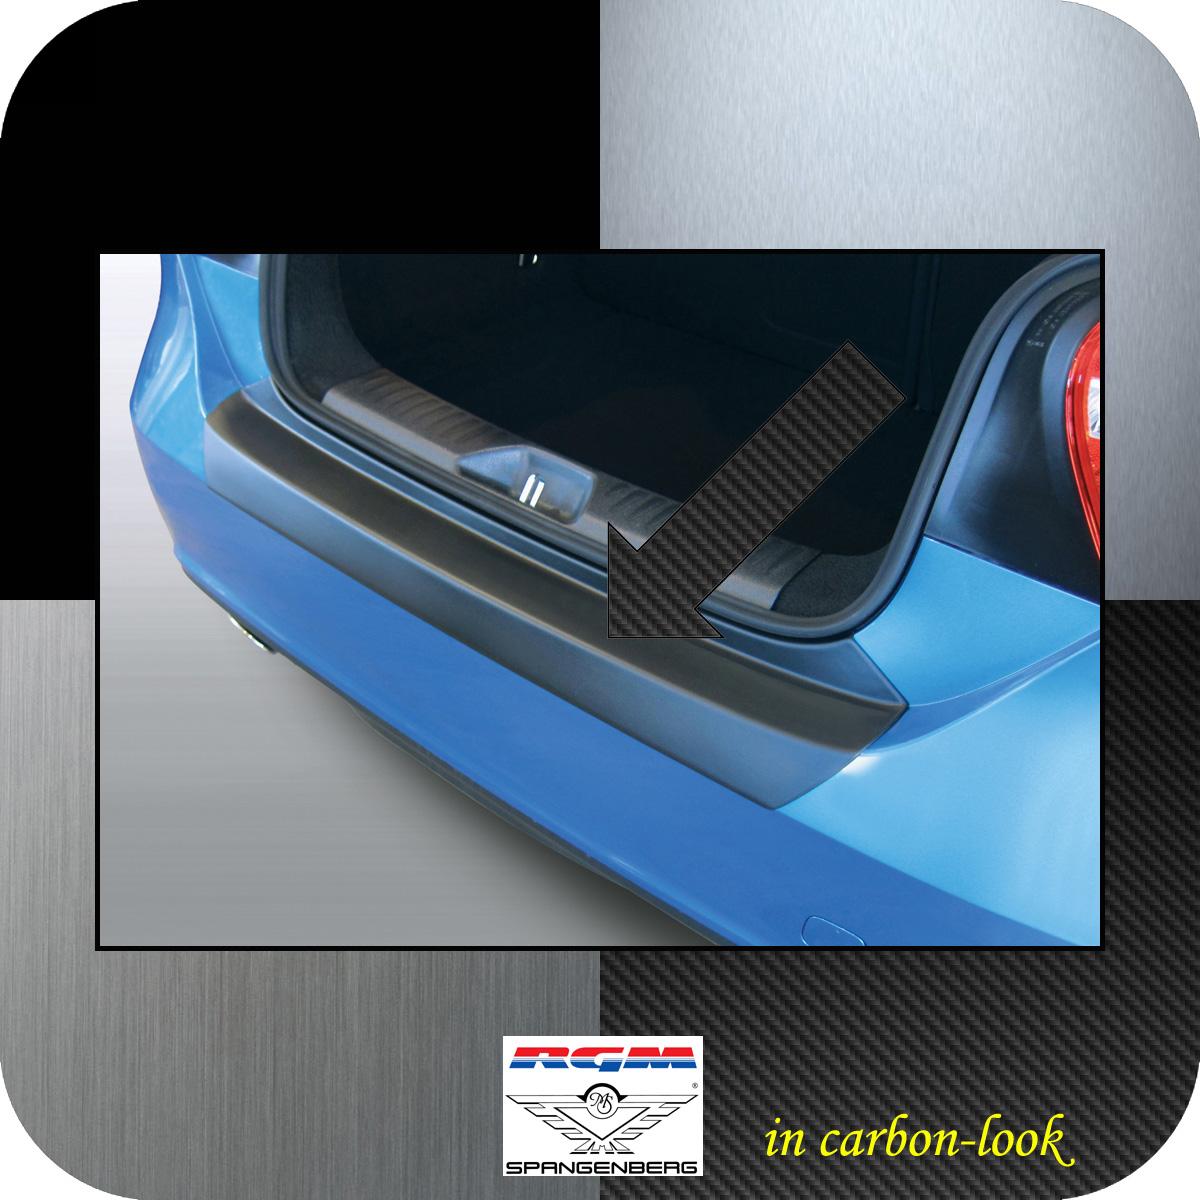 Ladekantenschutz Carbon-Look Mercedes A-Klasse W176 Schrägheck ab 2012- 3509619